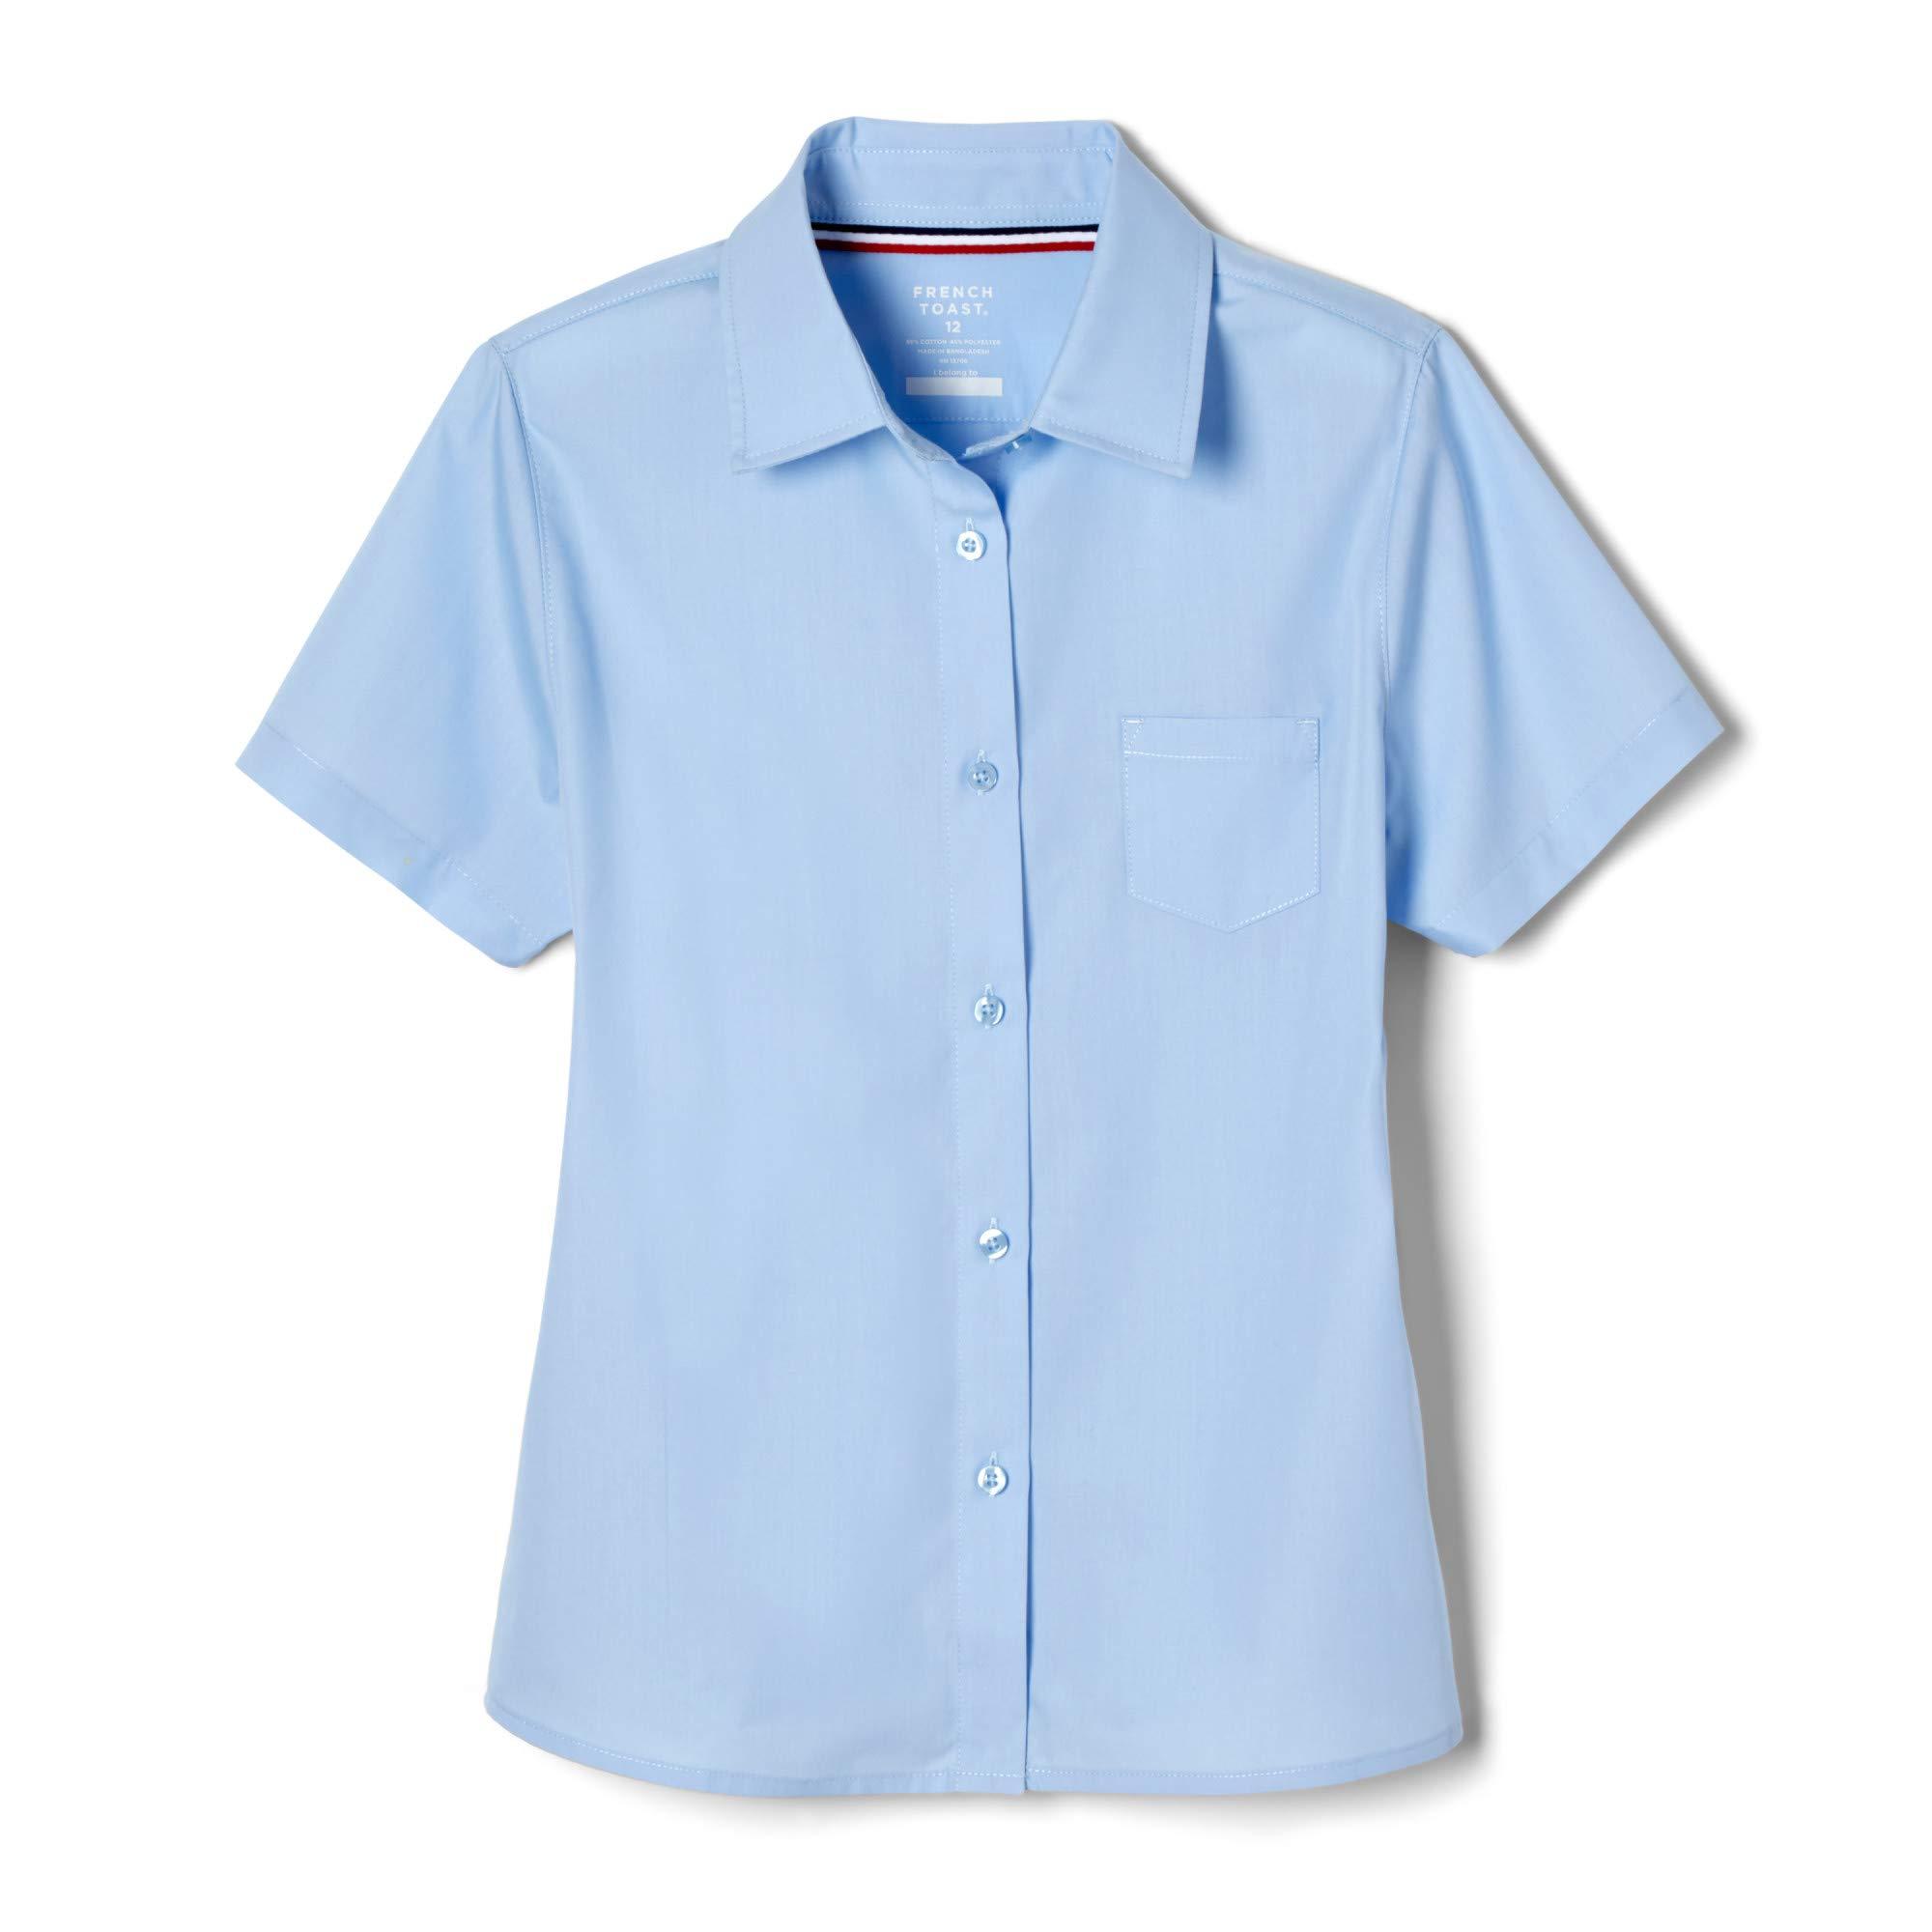 French Toast Girls' Big Short Sleeve Pocket Shirt, Light Blue, 16 by French Toast